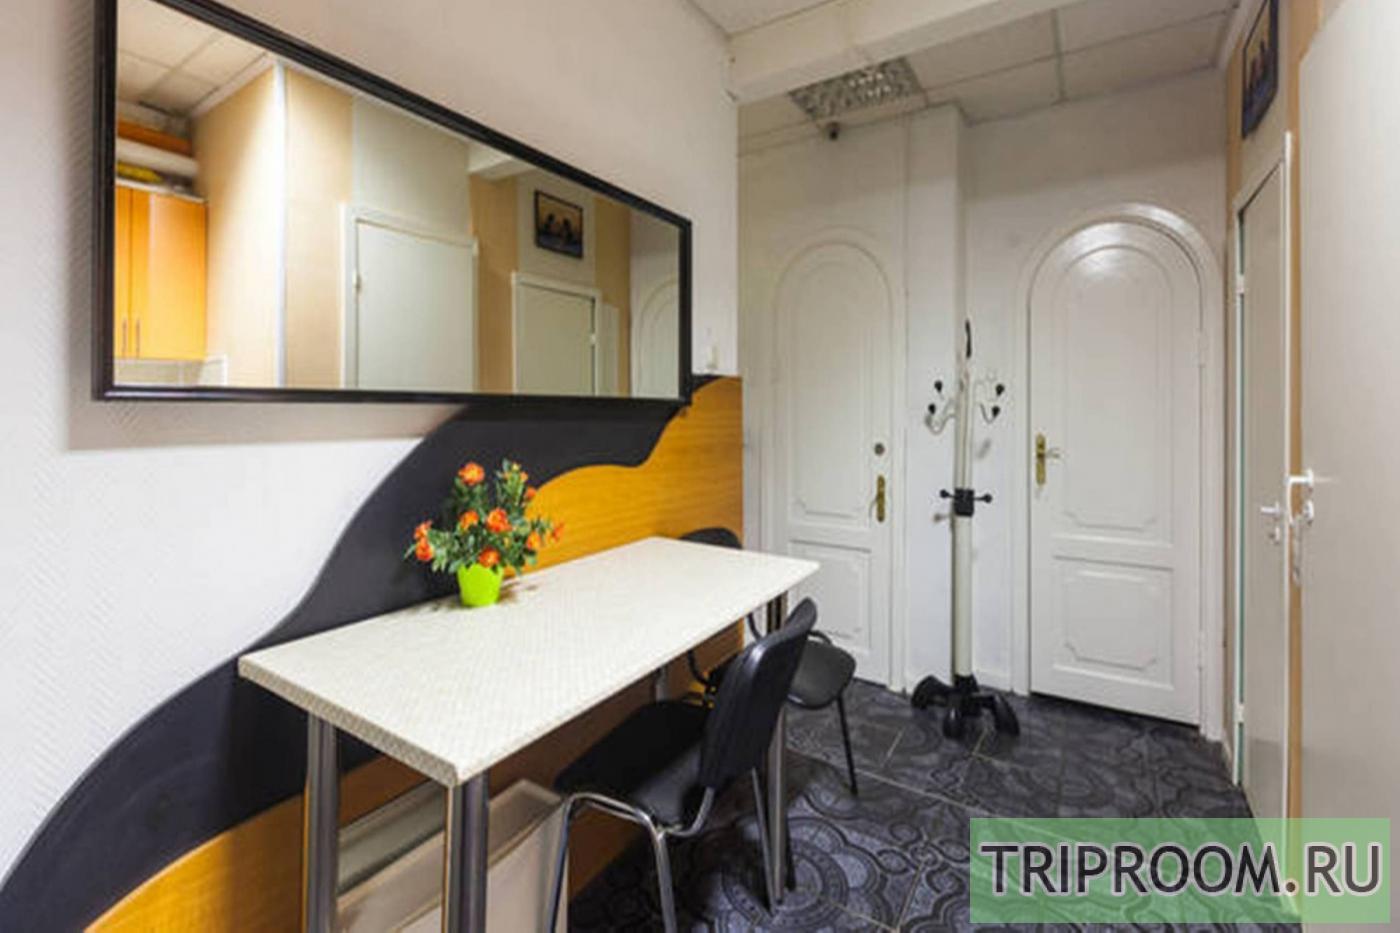 Комната в 4х-комнатной квартире посуточно (вариант № 28401), ул. набережная реки Фонтанка, фото № 5